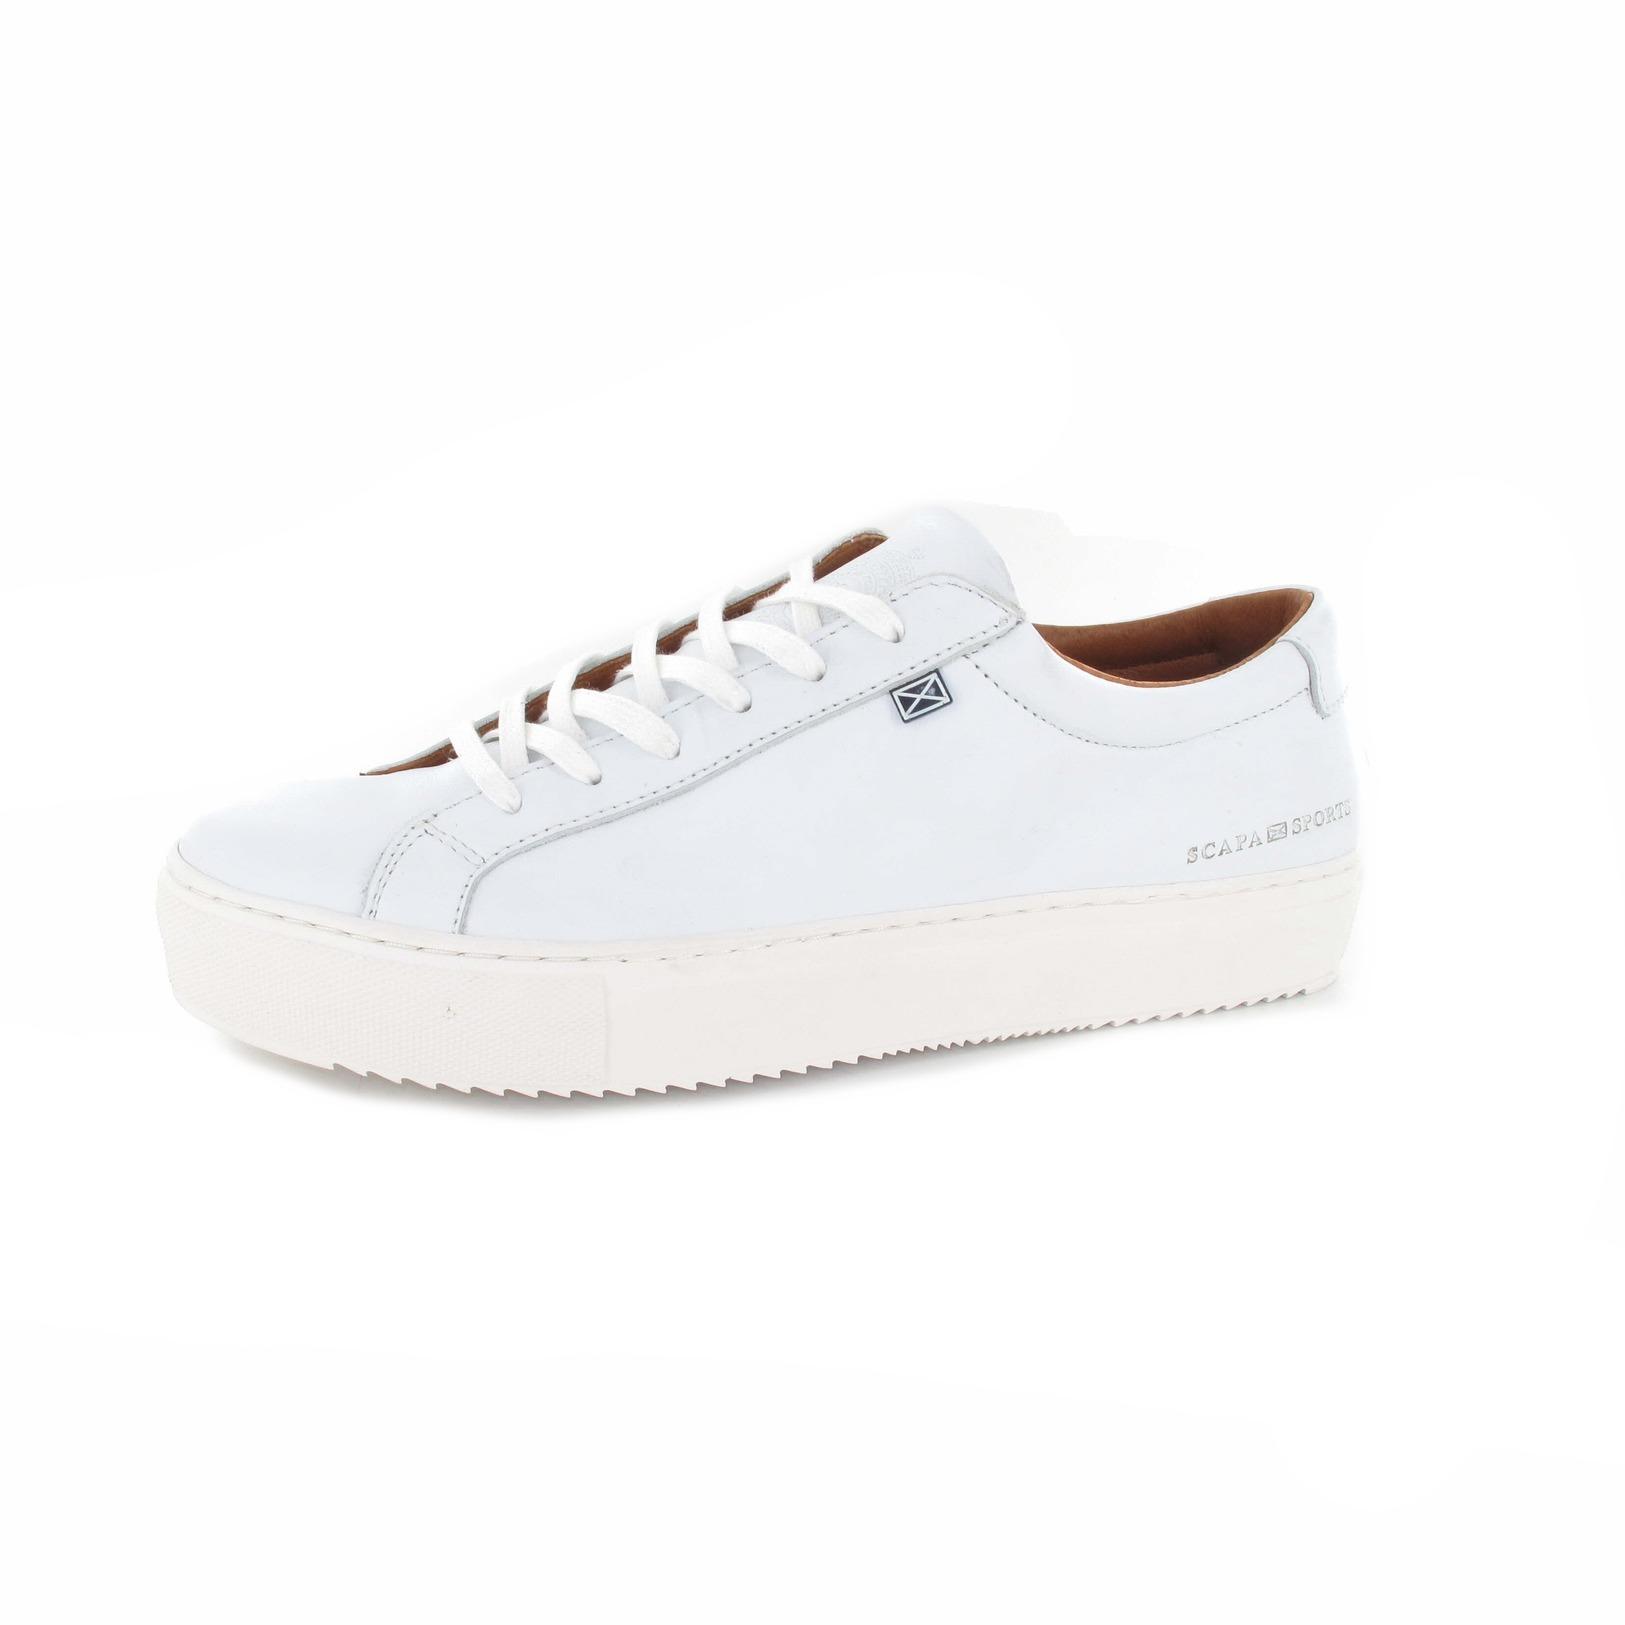 Chaussures Scapa / Dentelle - Chaussures De Sport, Blanc